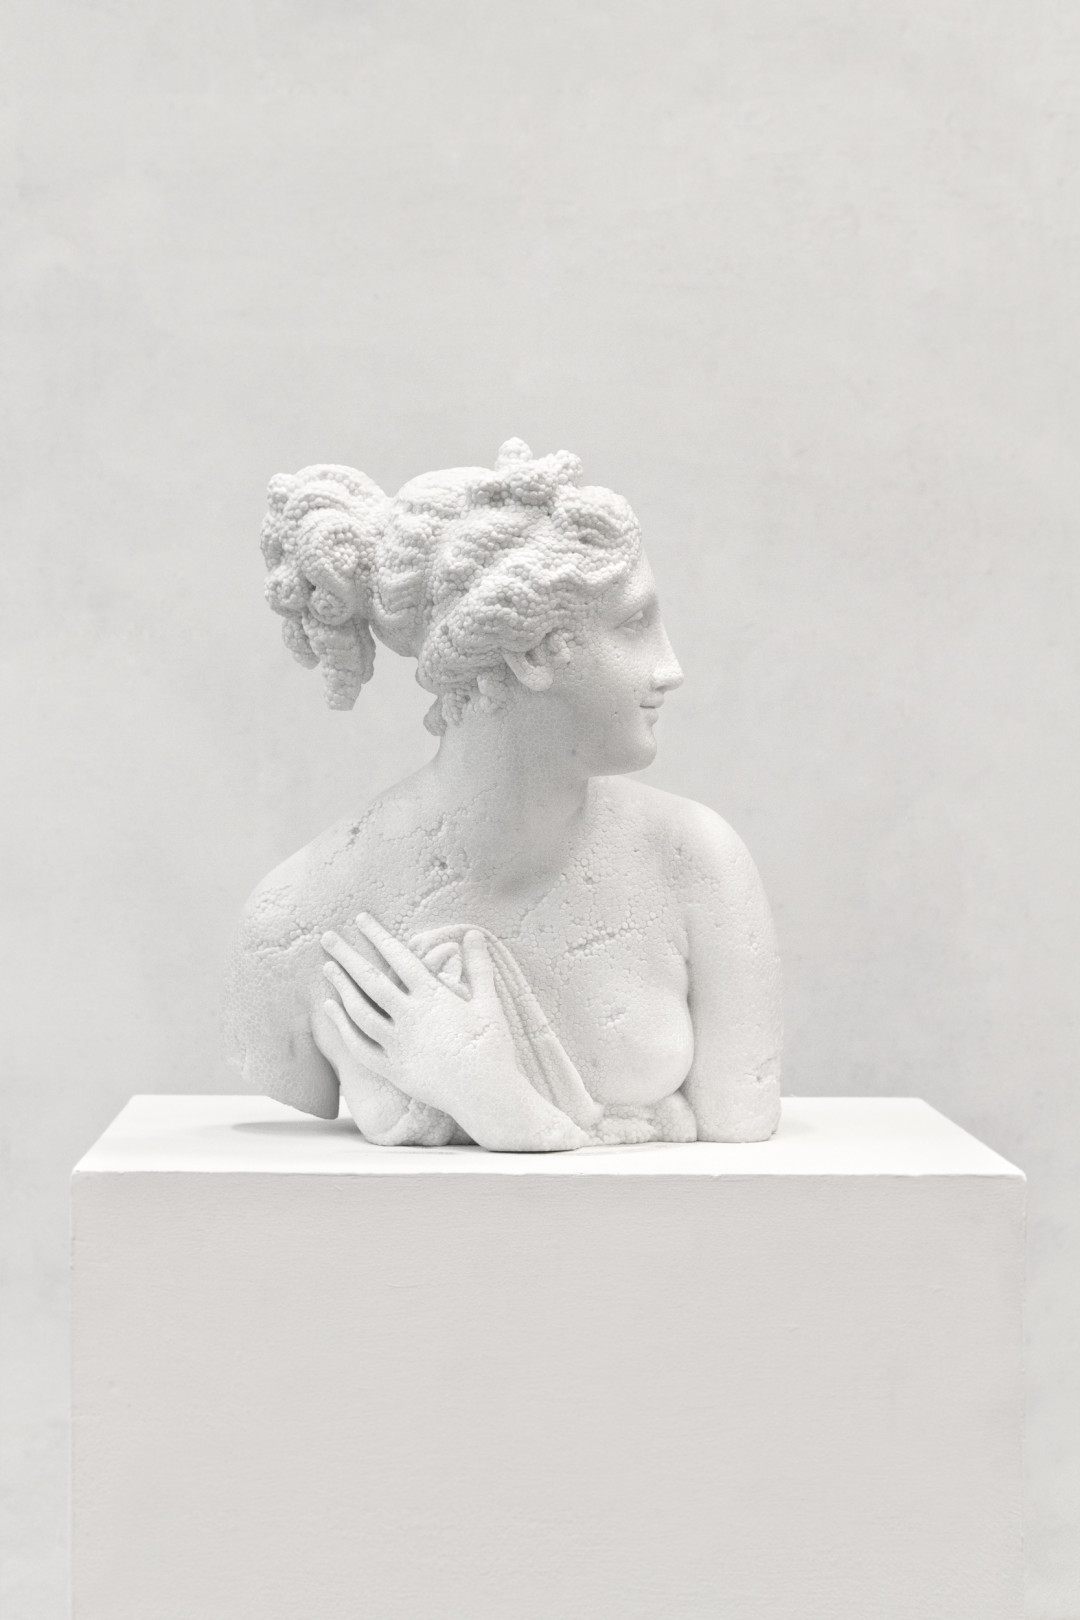 venere-italica-2016-marmo-bianco-cm-53-x-41-x-45-8653